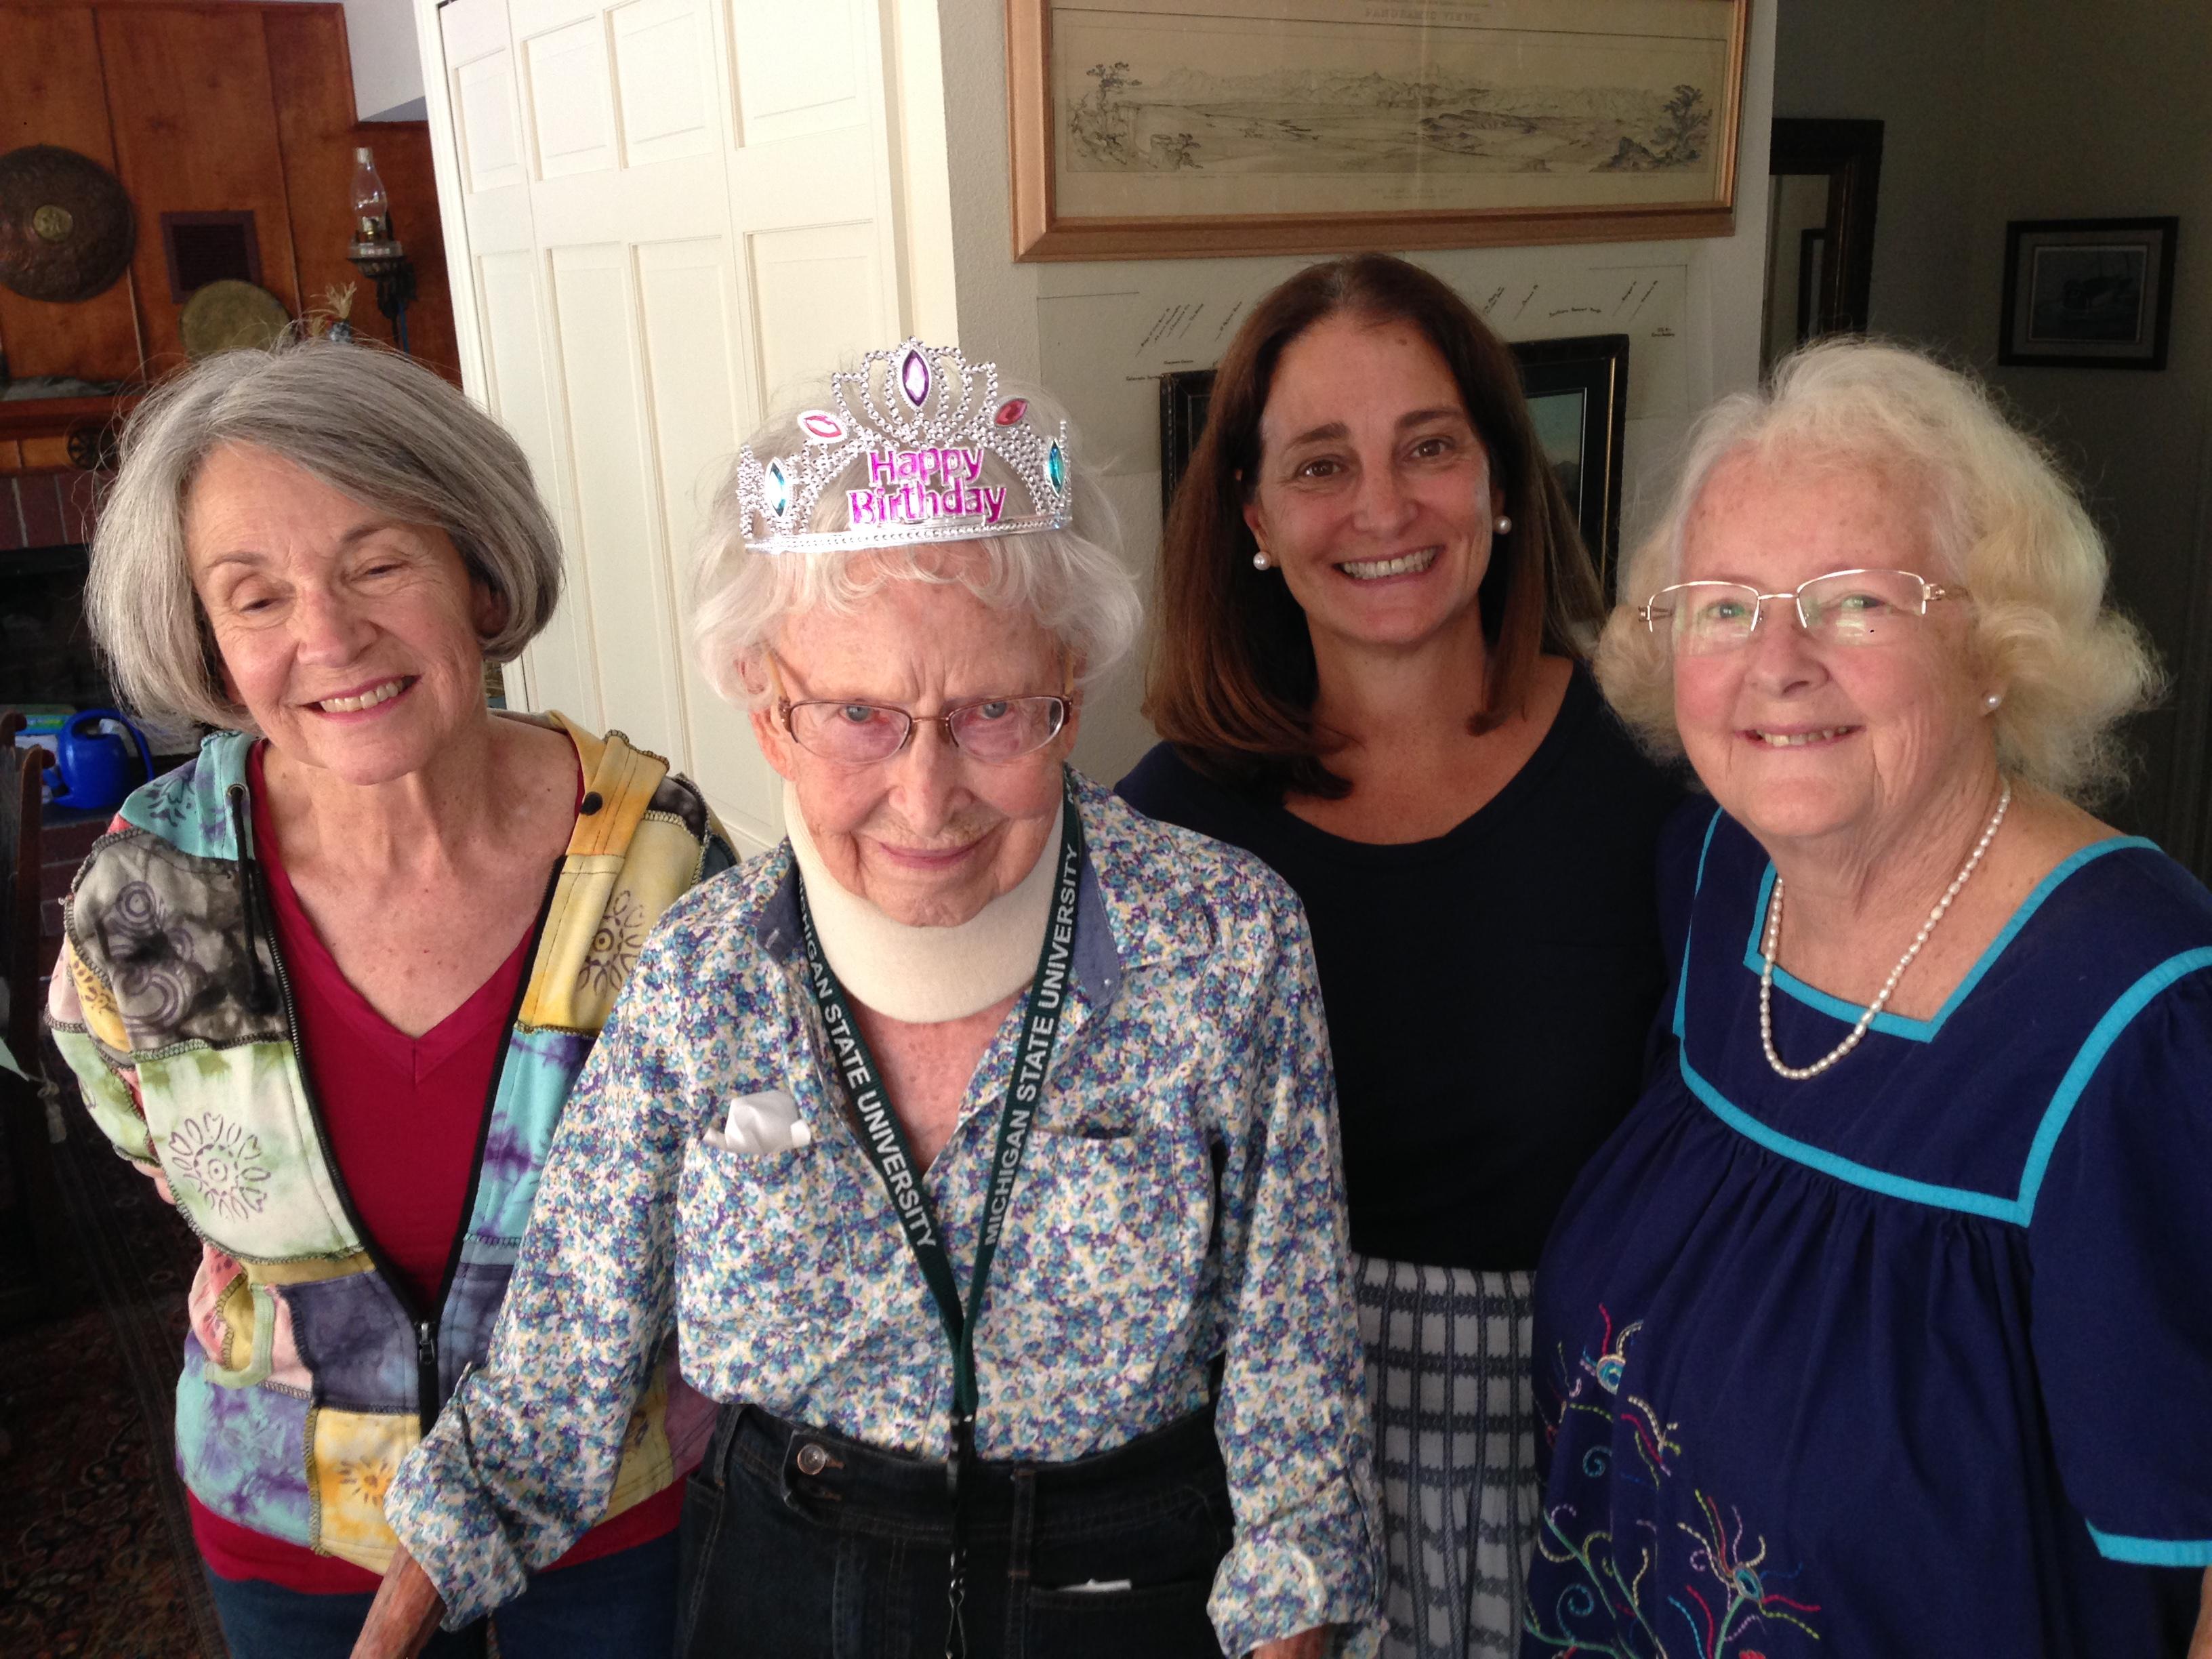 Nancy McCaffrey turns 101 years old!